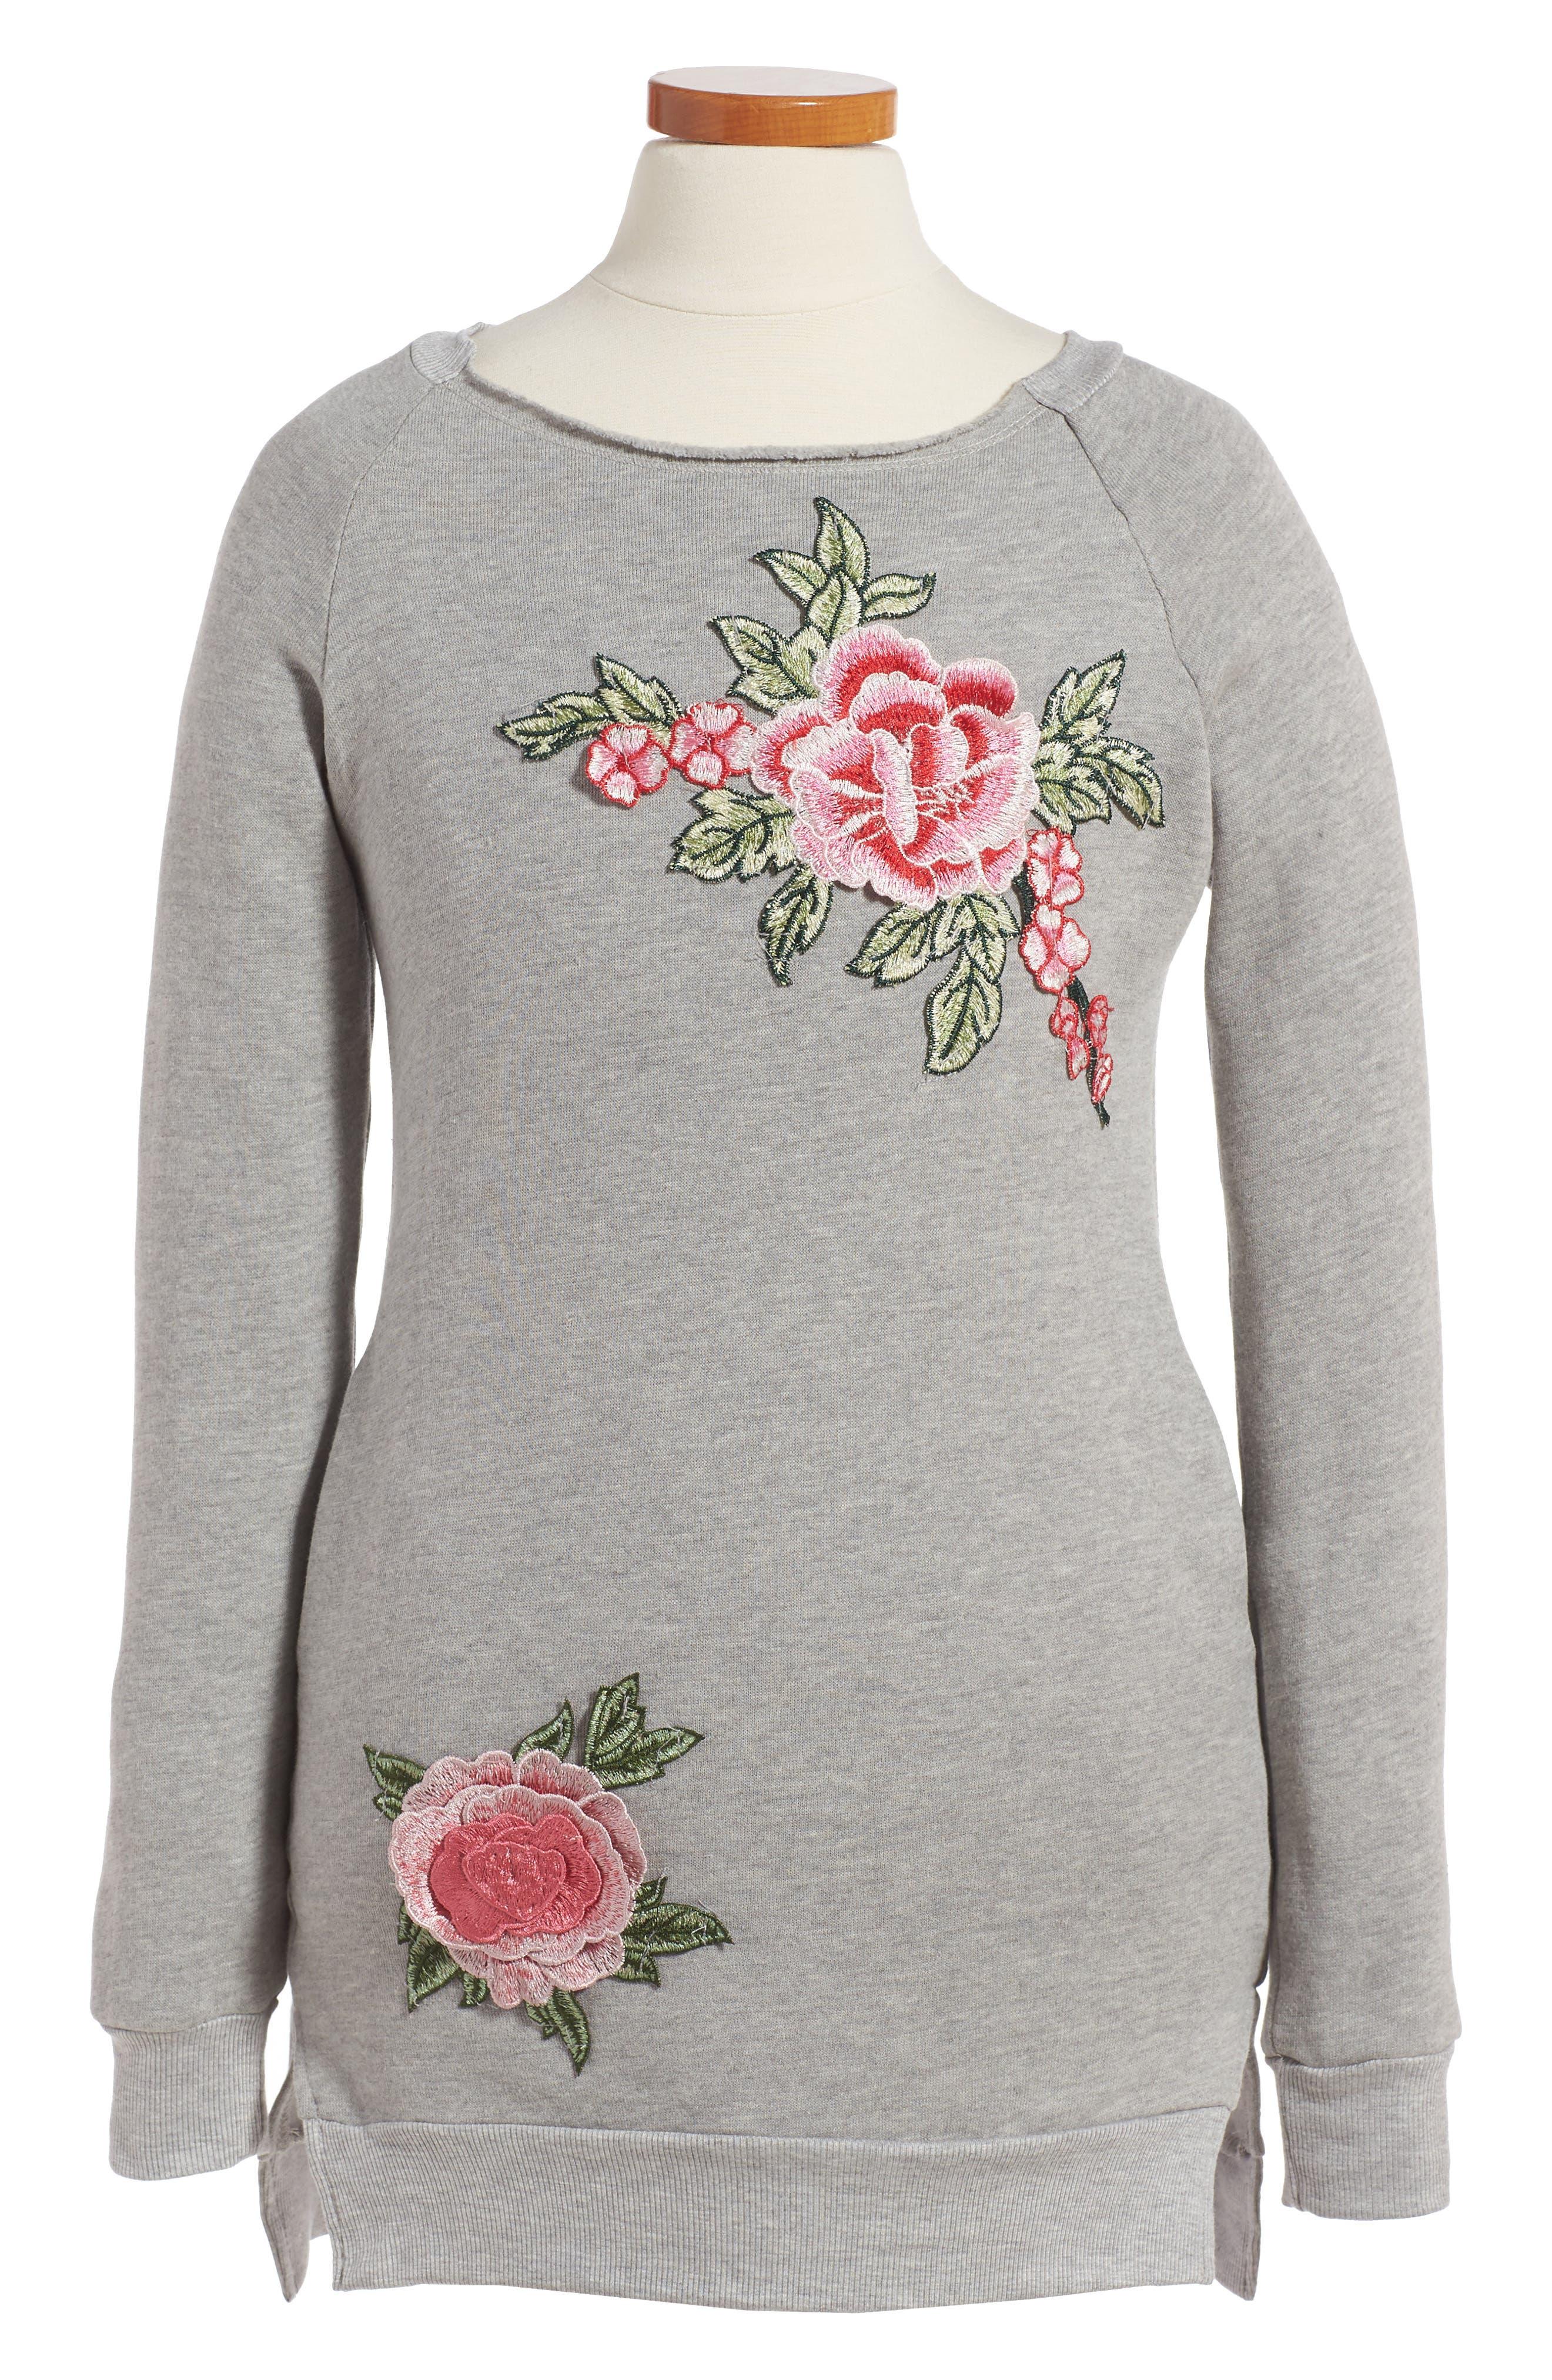 Alternate Image 1 Selected - PPLA Dreamer Appliqué Sweatshirt Dress (Big Girls)